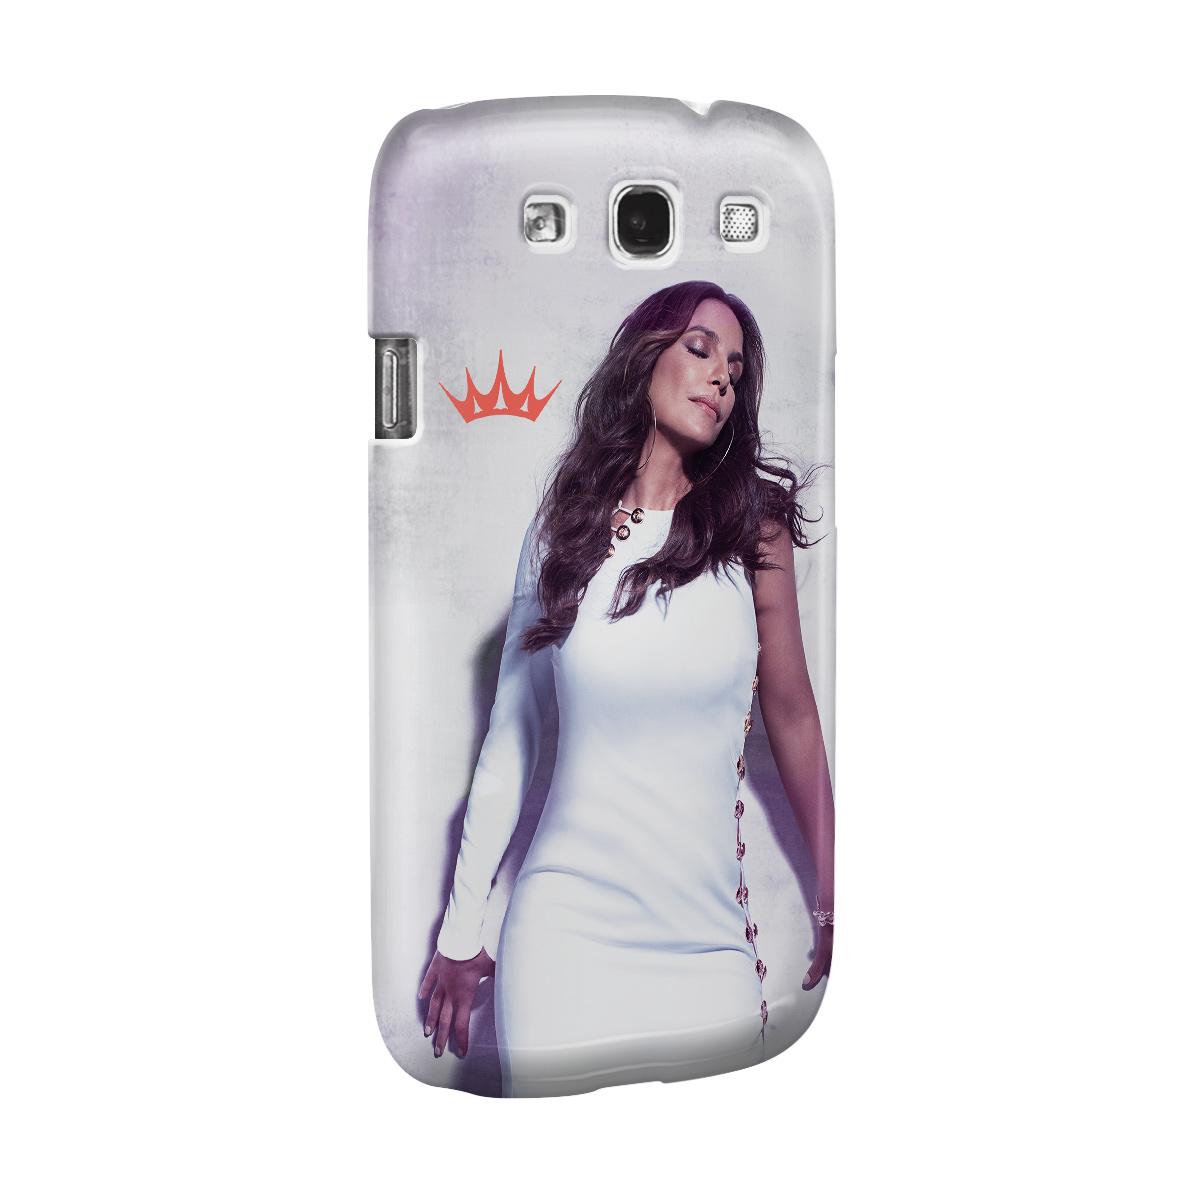 Capa para Samsung Galaxy S3 Ivete Sangalo Careless Whisper